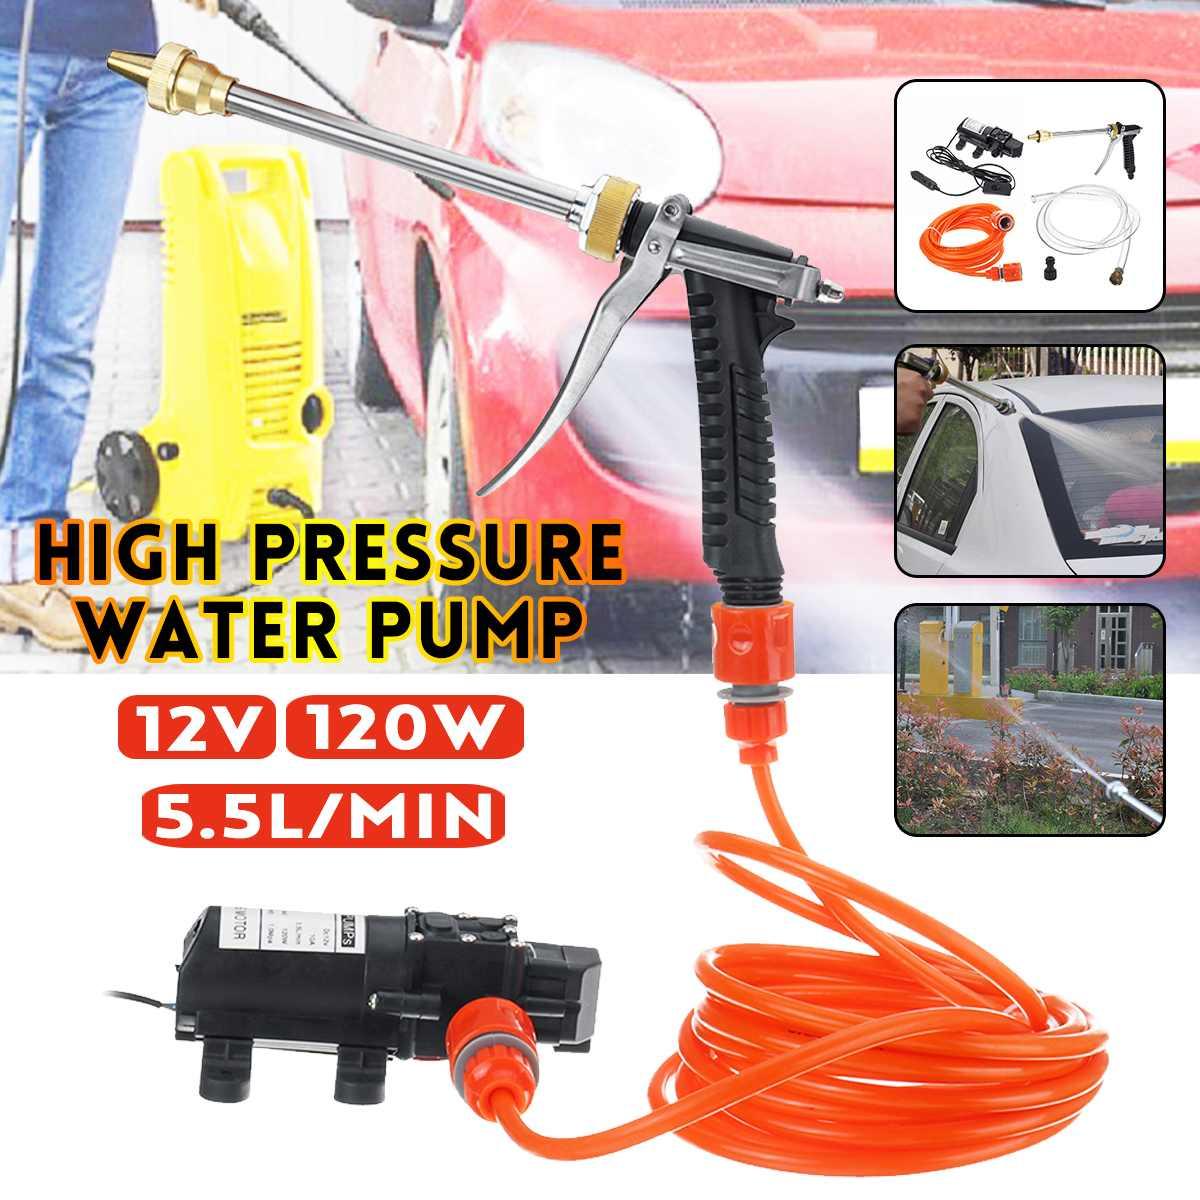 12V 120W Car Washer Pump High Pressure Car Electric Washer Wash Pump Set Portable Auto Washing Machine Kit Washer Sprayer